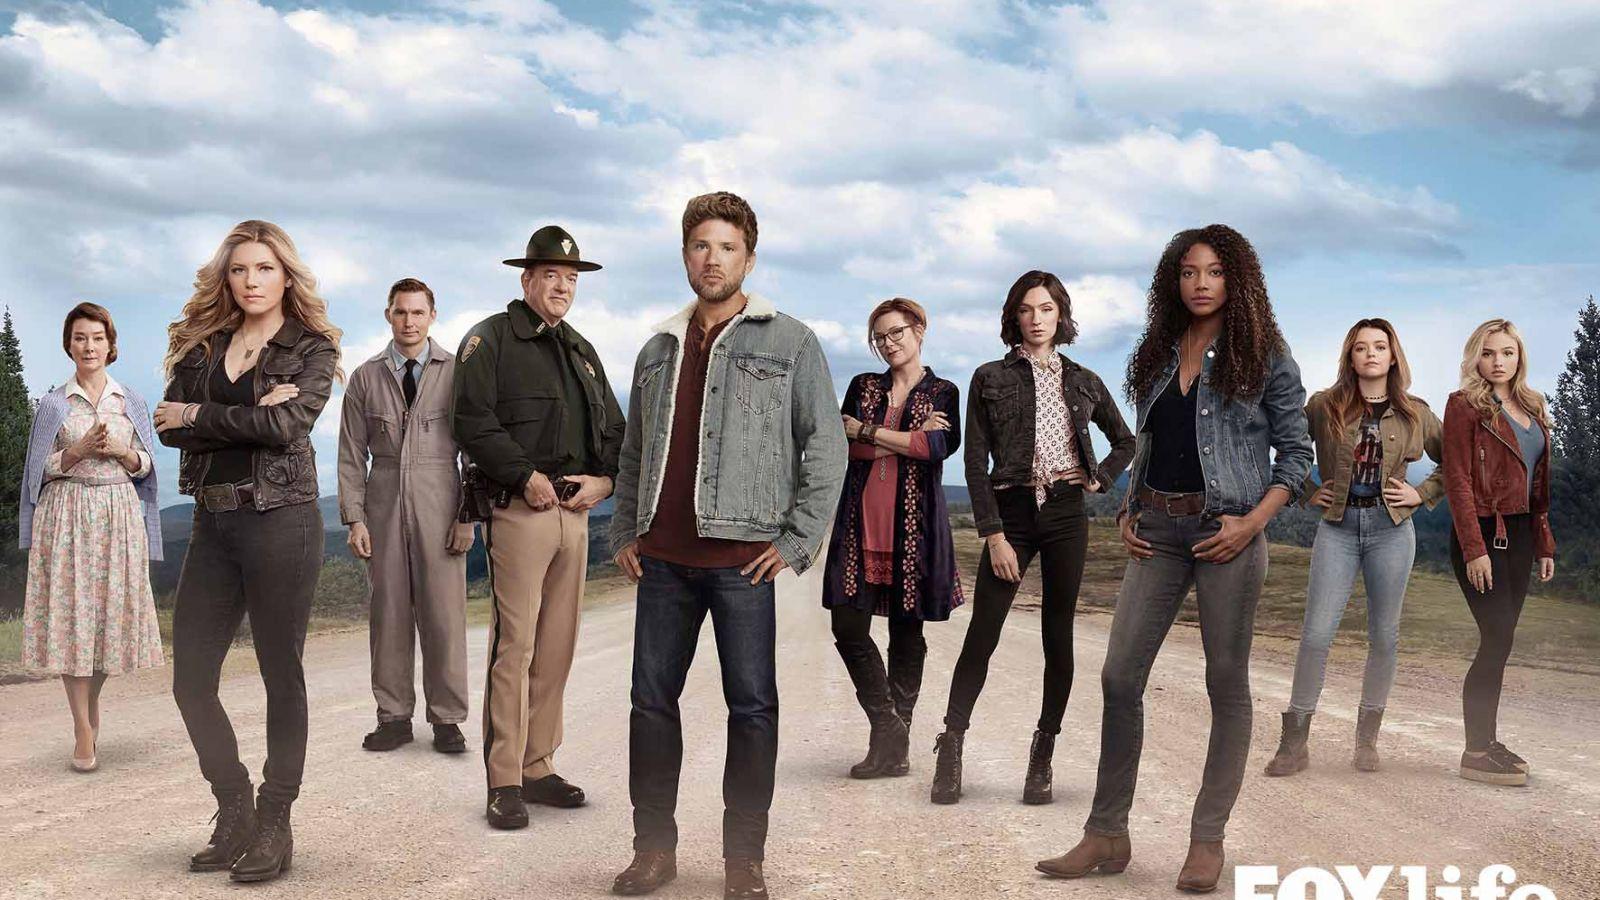 Big Sky: Έρχεται η νέα δραματική σειρά με τον Ryan Phillippe στο Fox Life [vid]